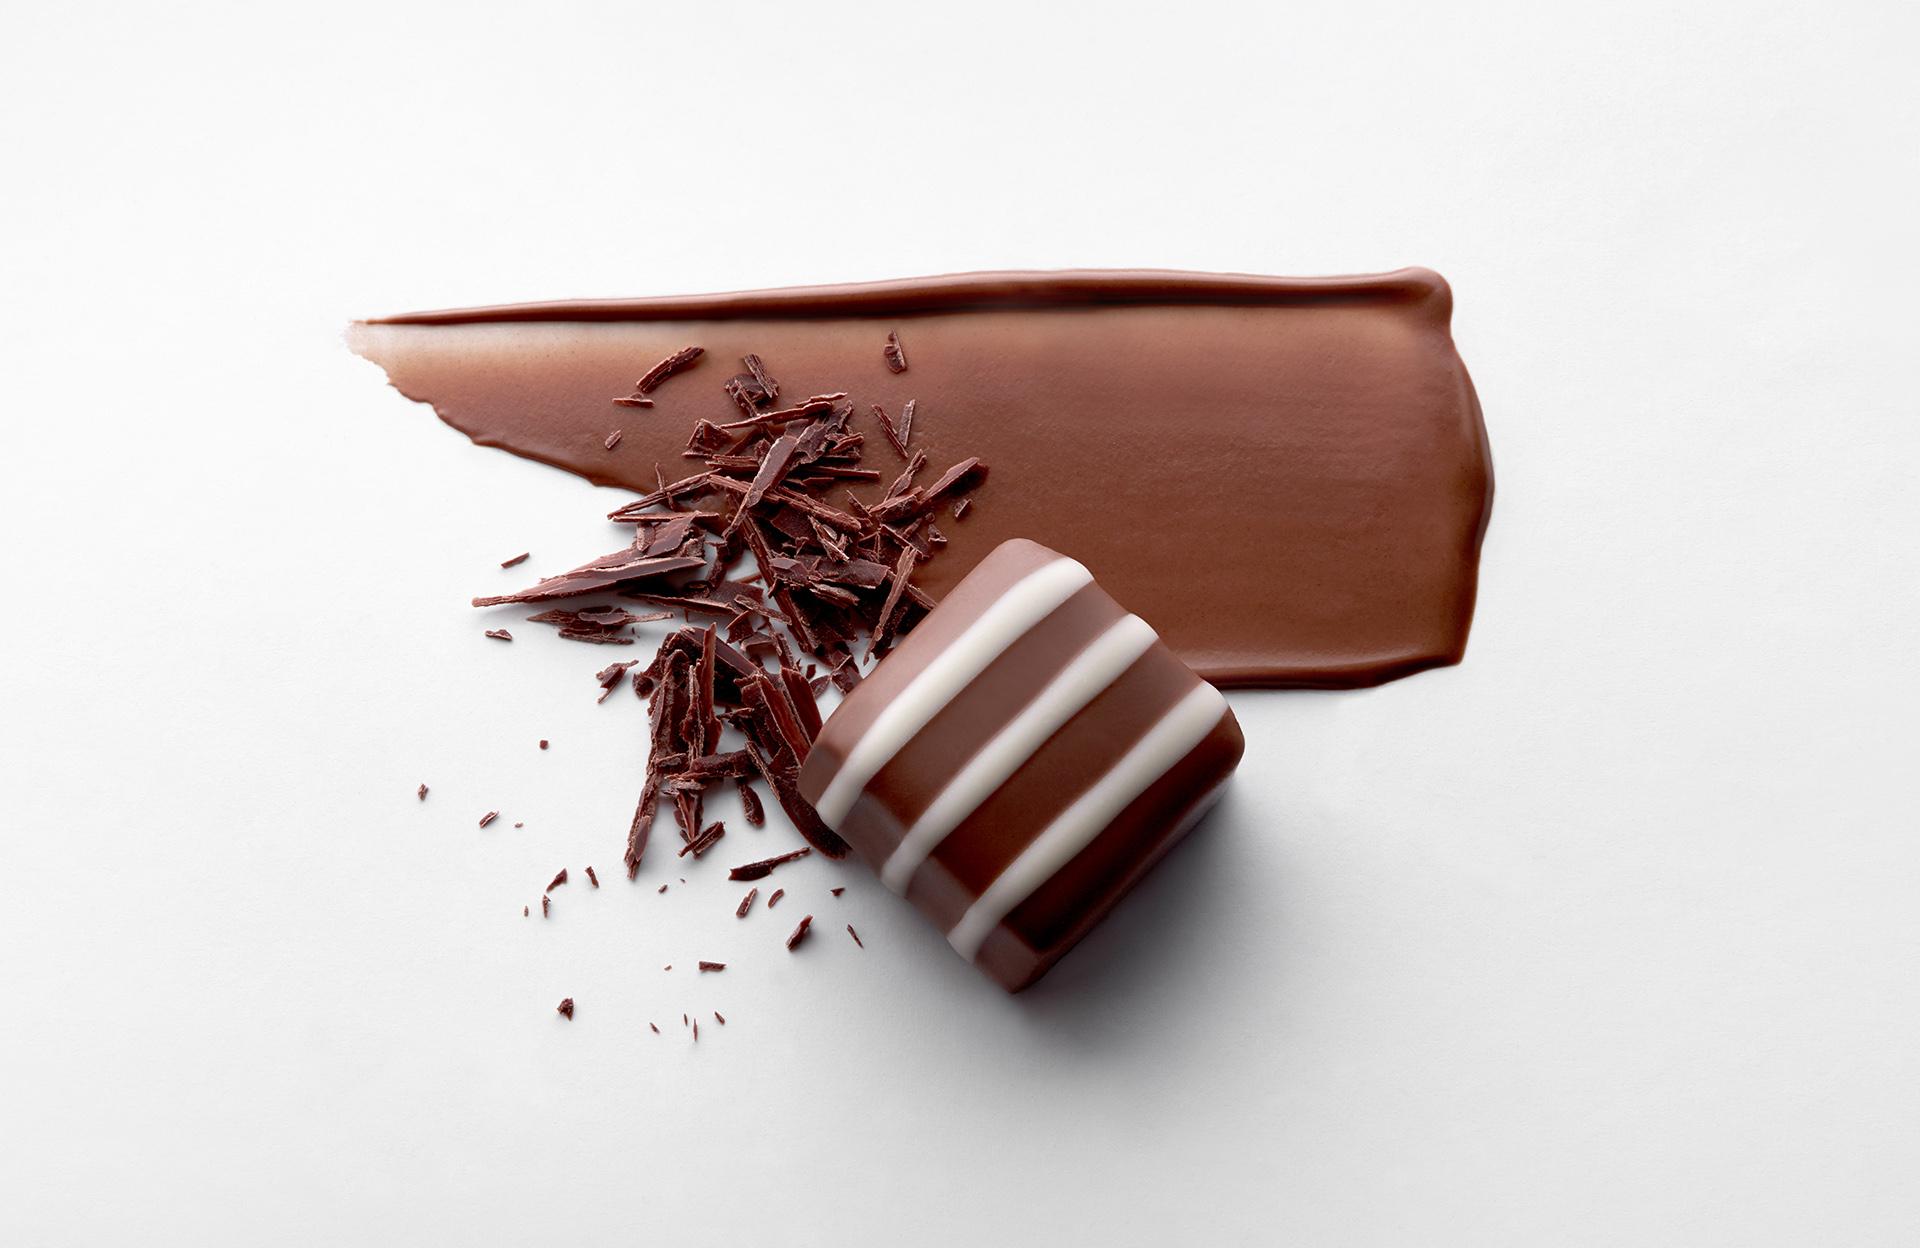 chocolate-smears-swatches-creative-food-still-life-photographer-london-photography-1.jpg